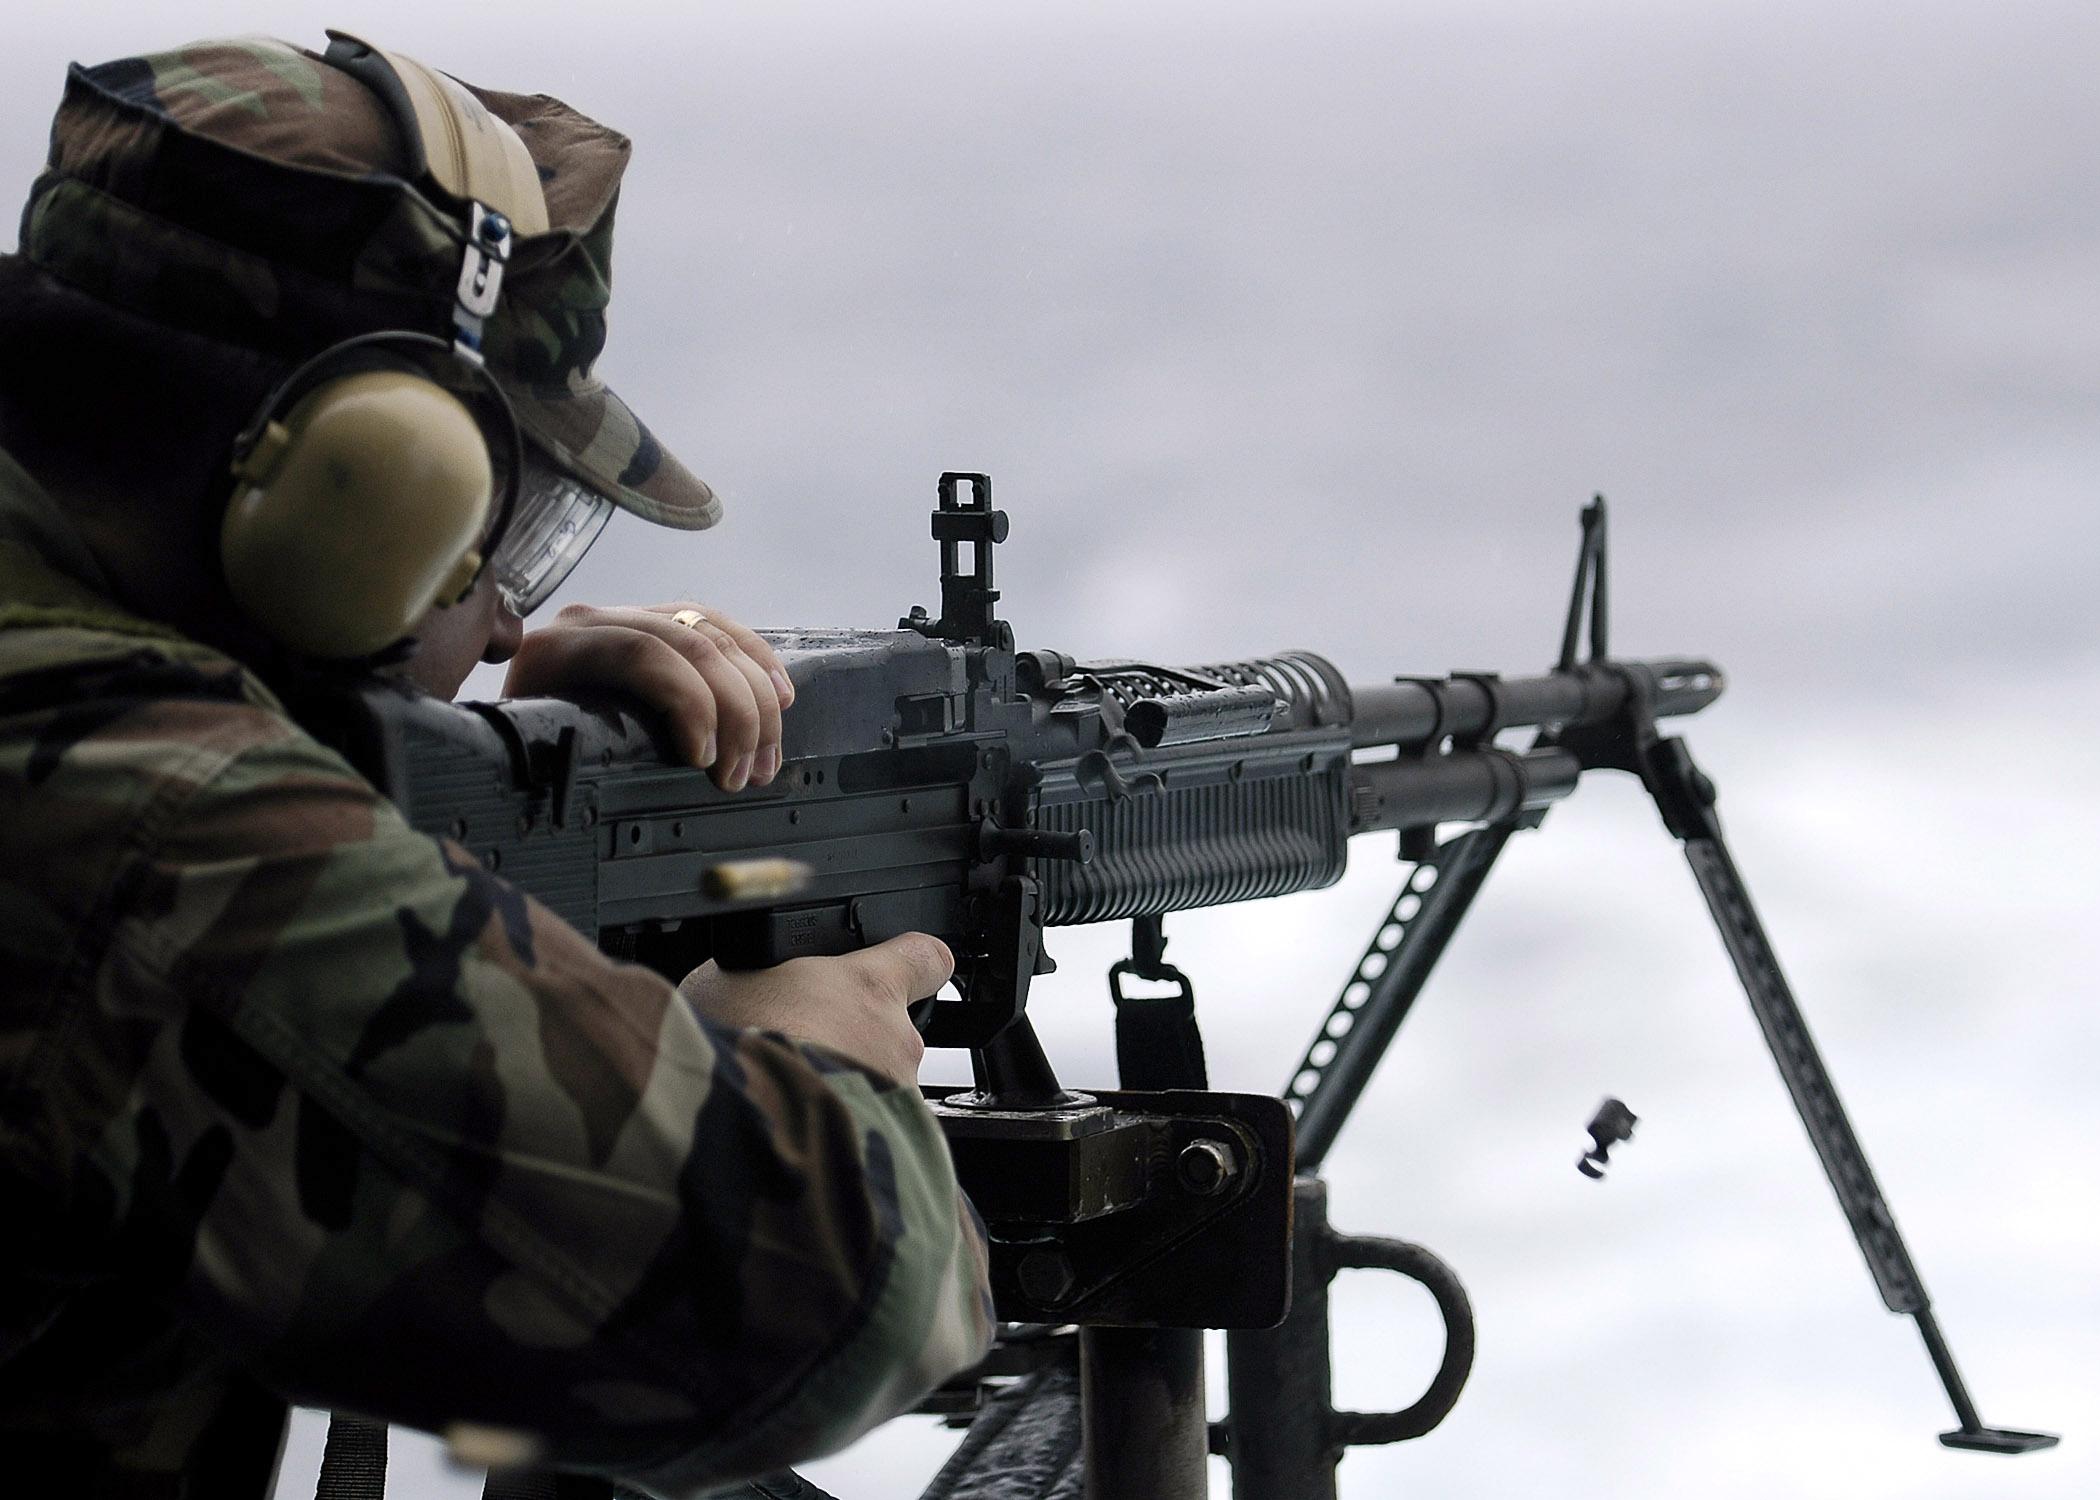 m60 machine gun - photo #40